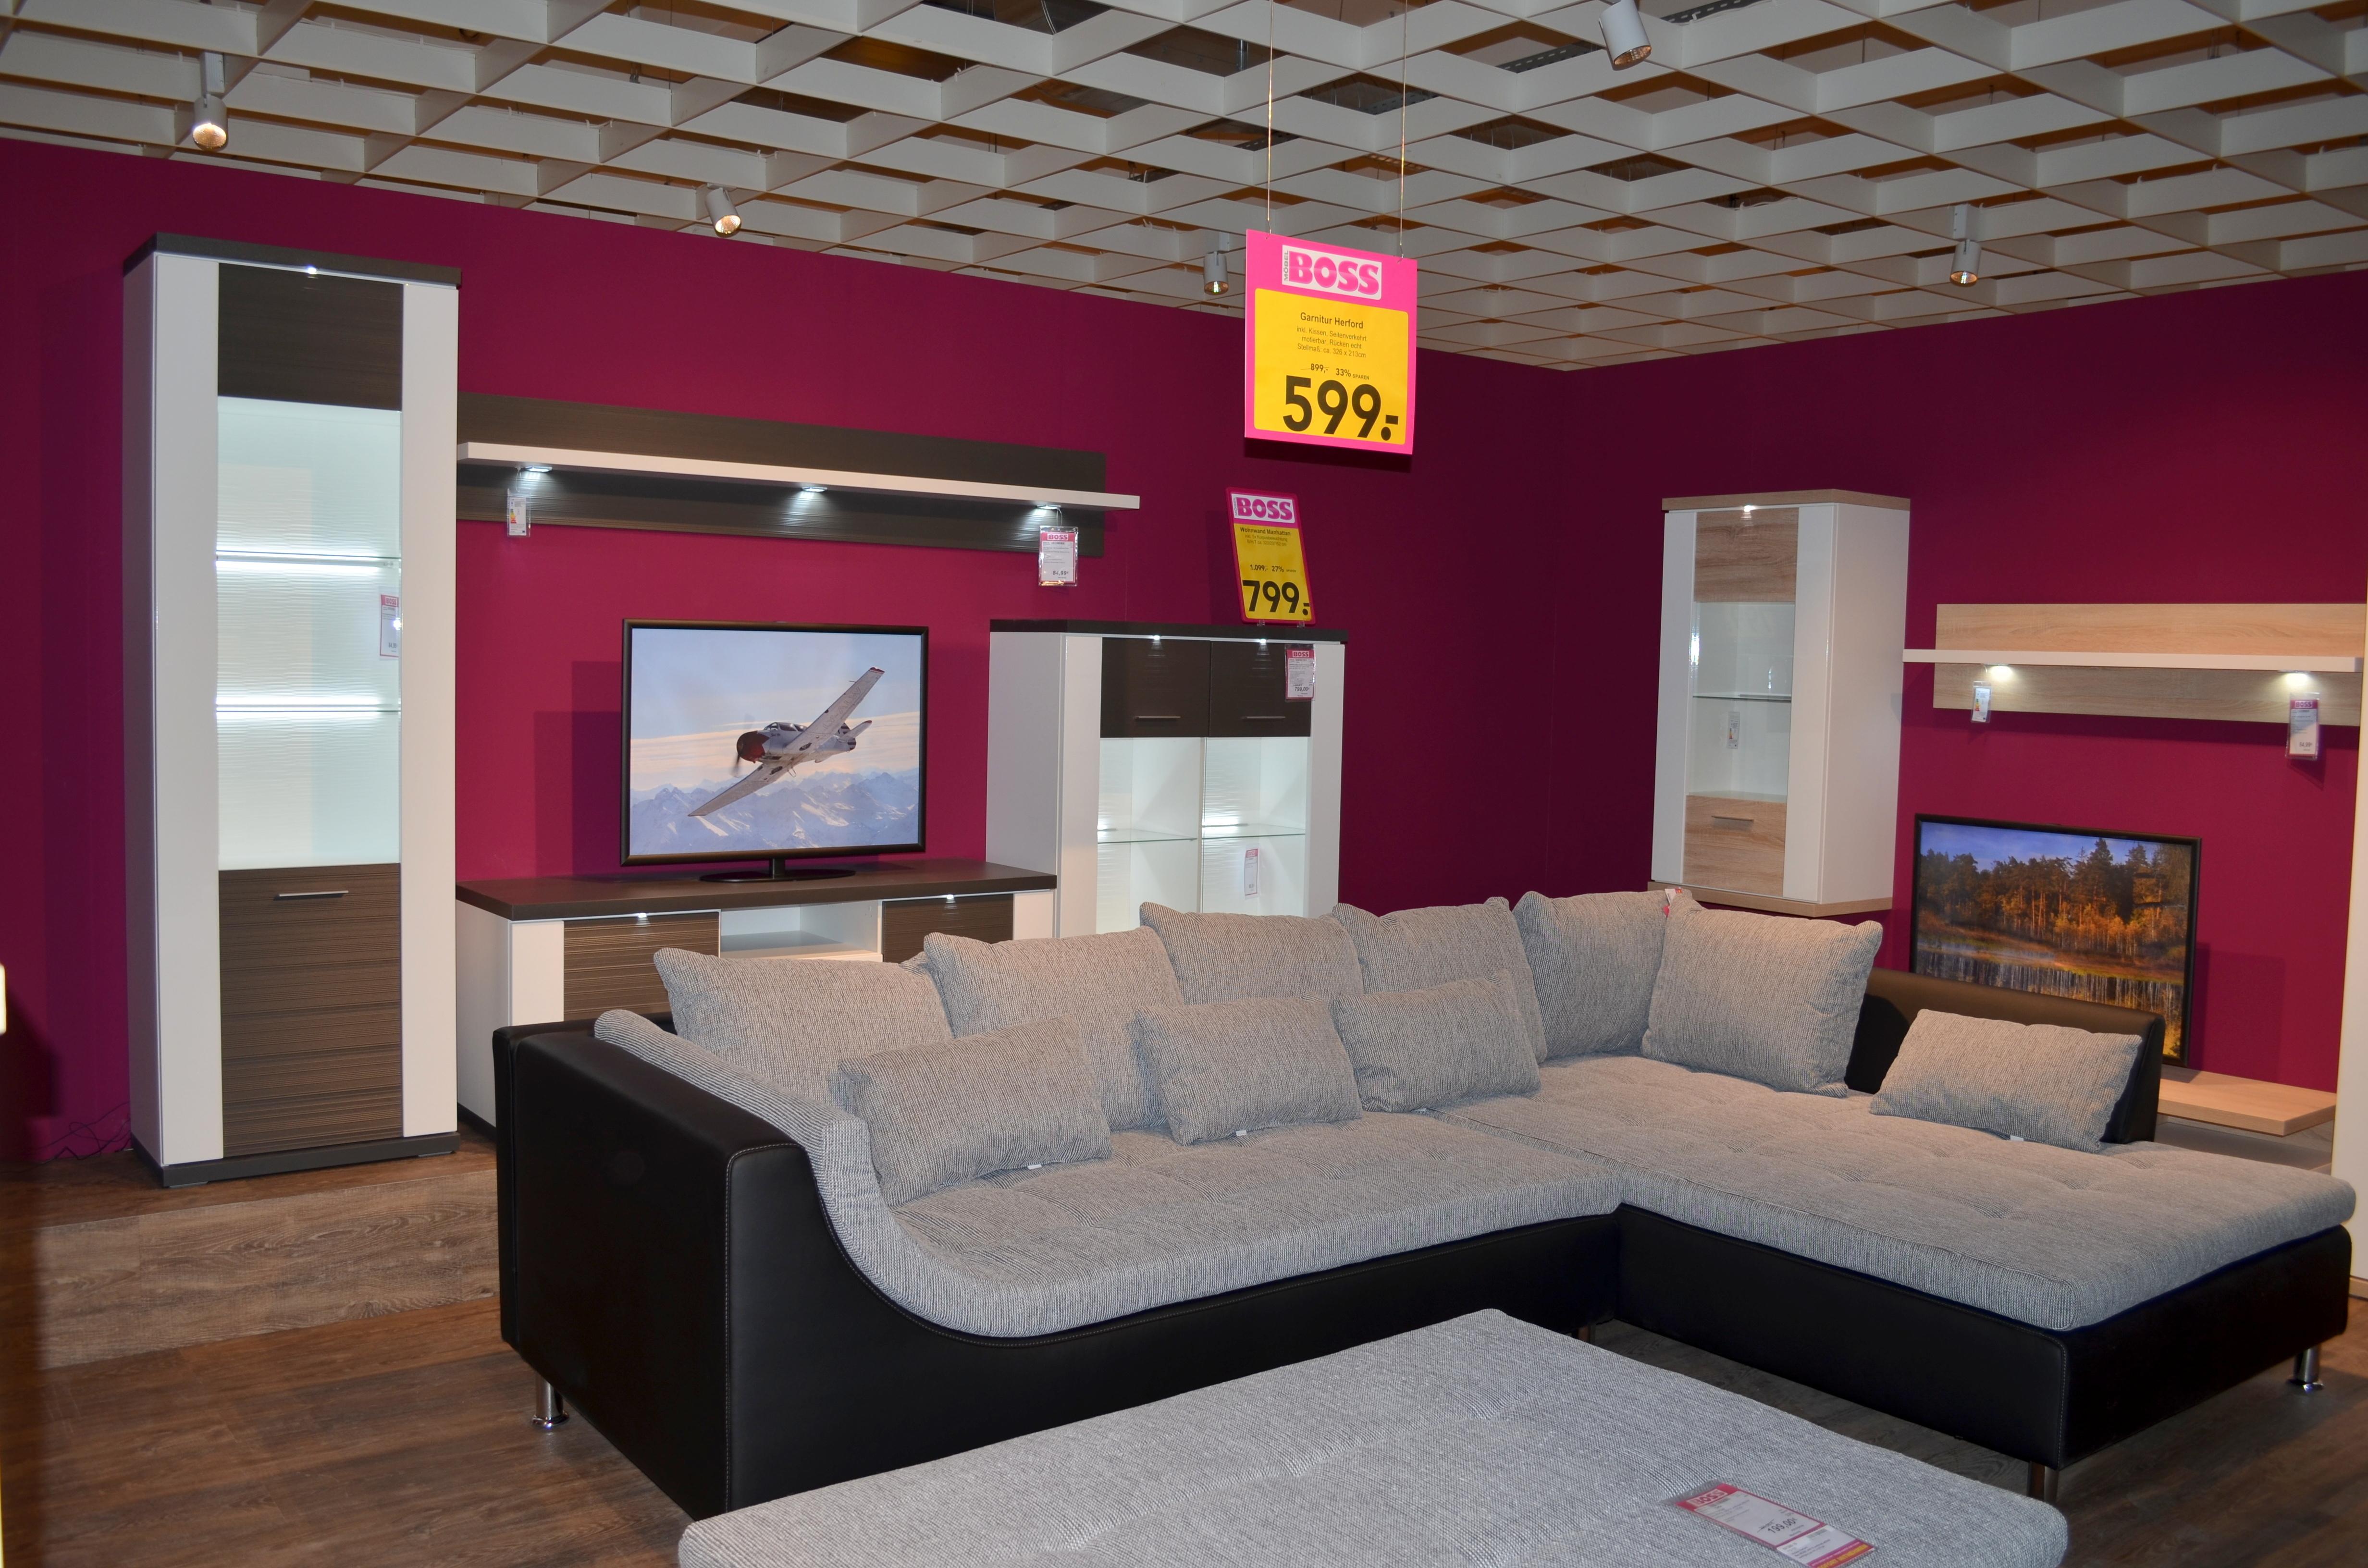 m beldiscounter sb m bel boss er ffnete am 8 mai in mahlsdorf mahlsdorf. Black Bedroom Furniture Sets. Home Design Ideas